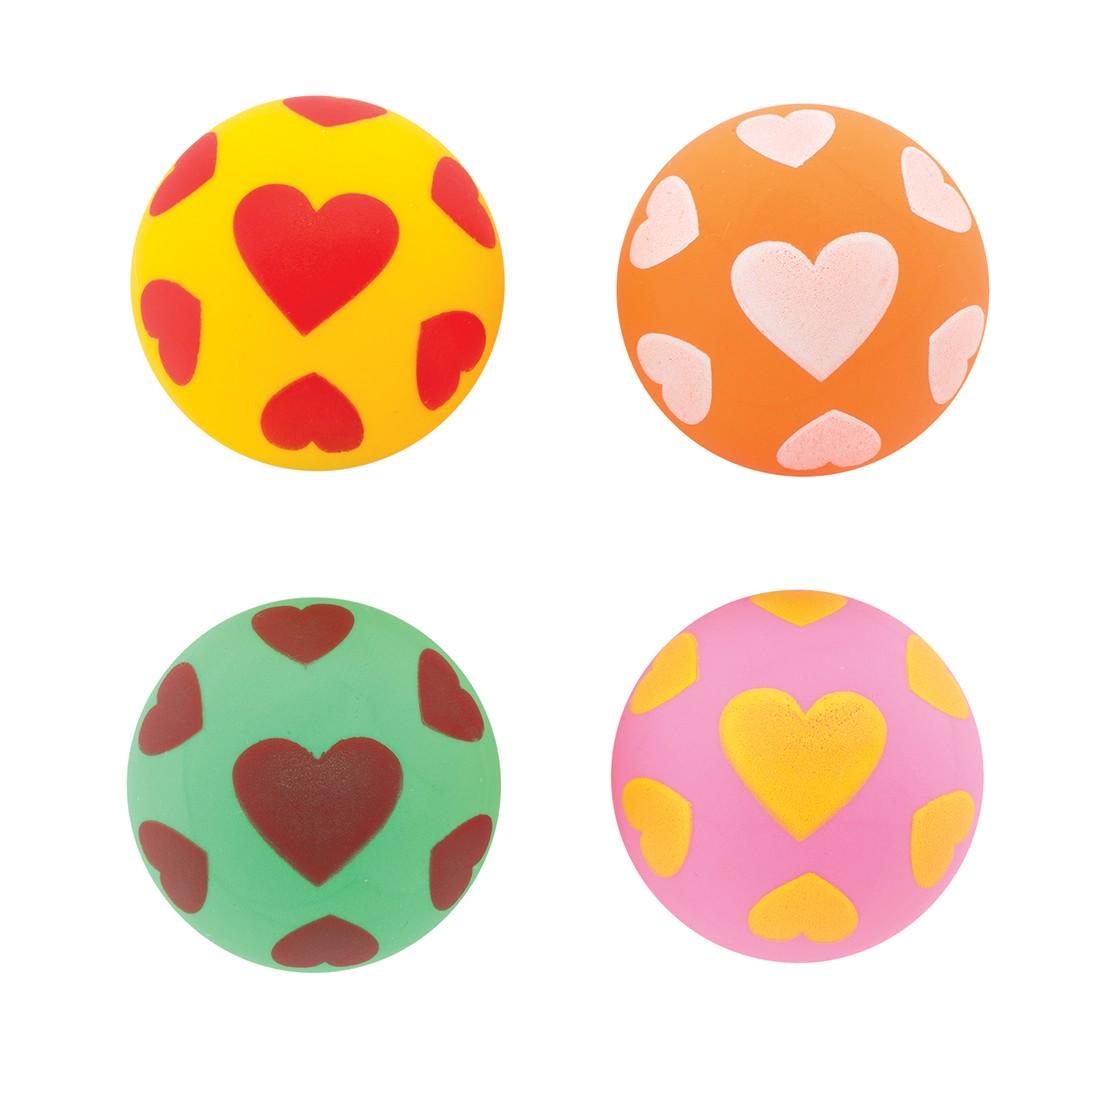 Scatter Heart Bouncing Balls [image]